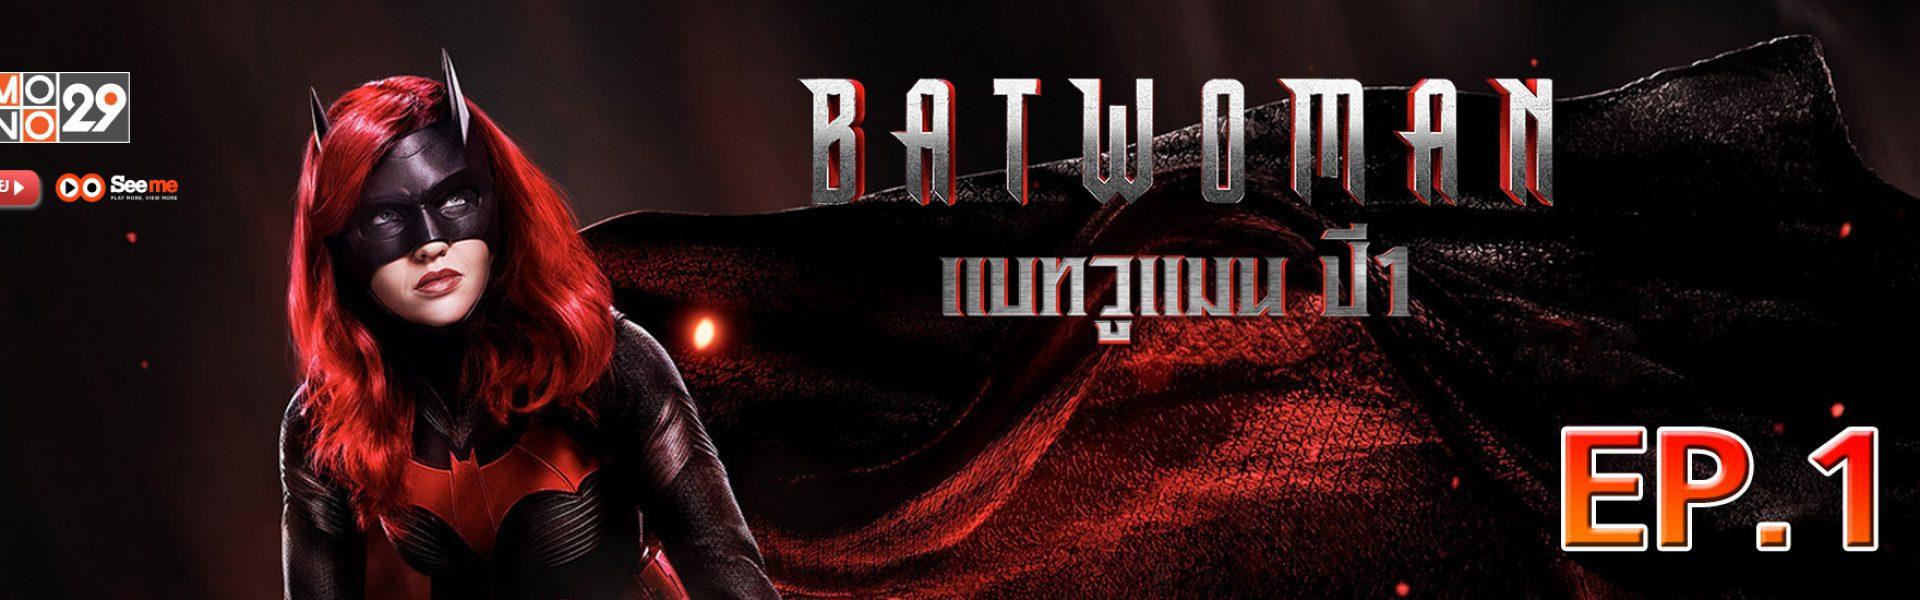 Batwoman แบทวูแมน ปี 1 EP.1 [1/5]